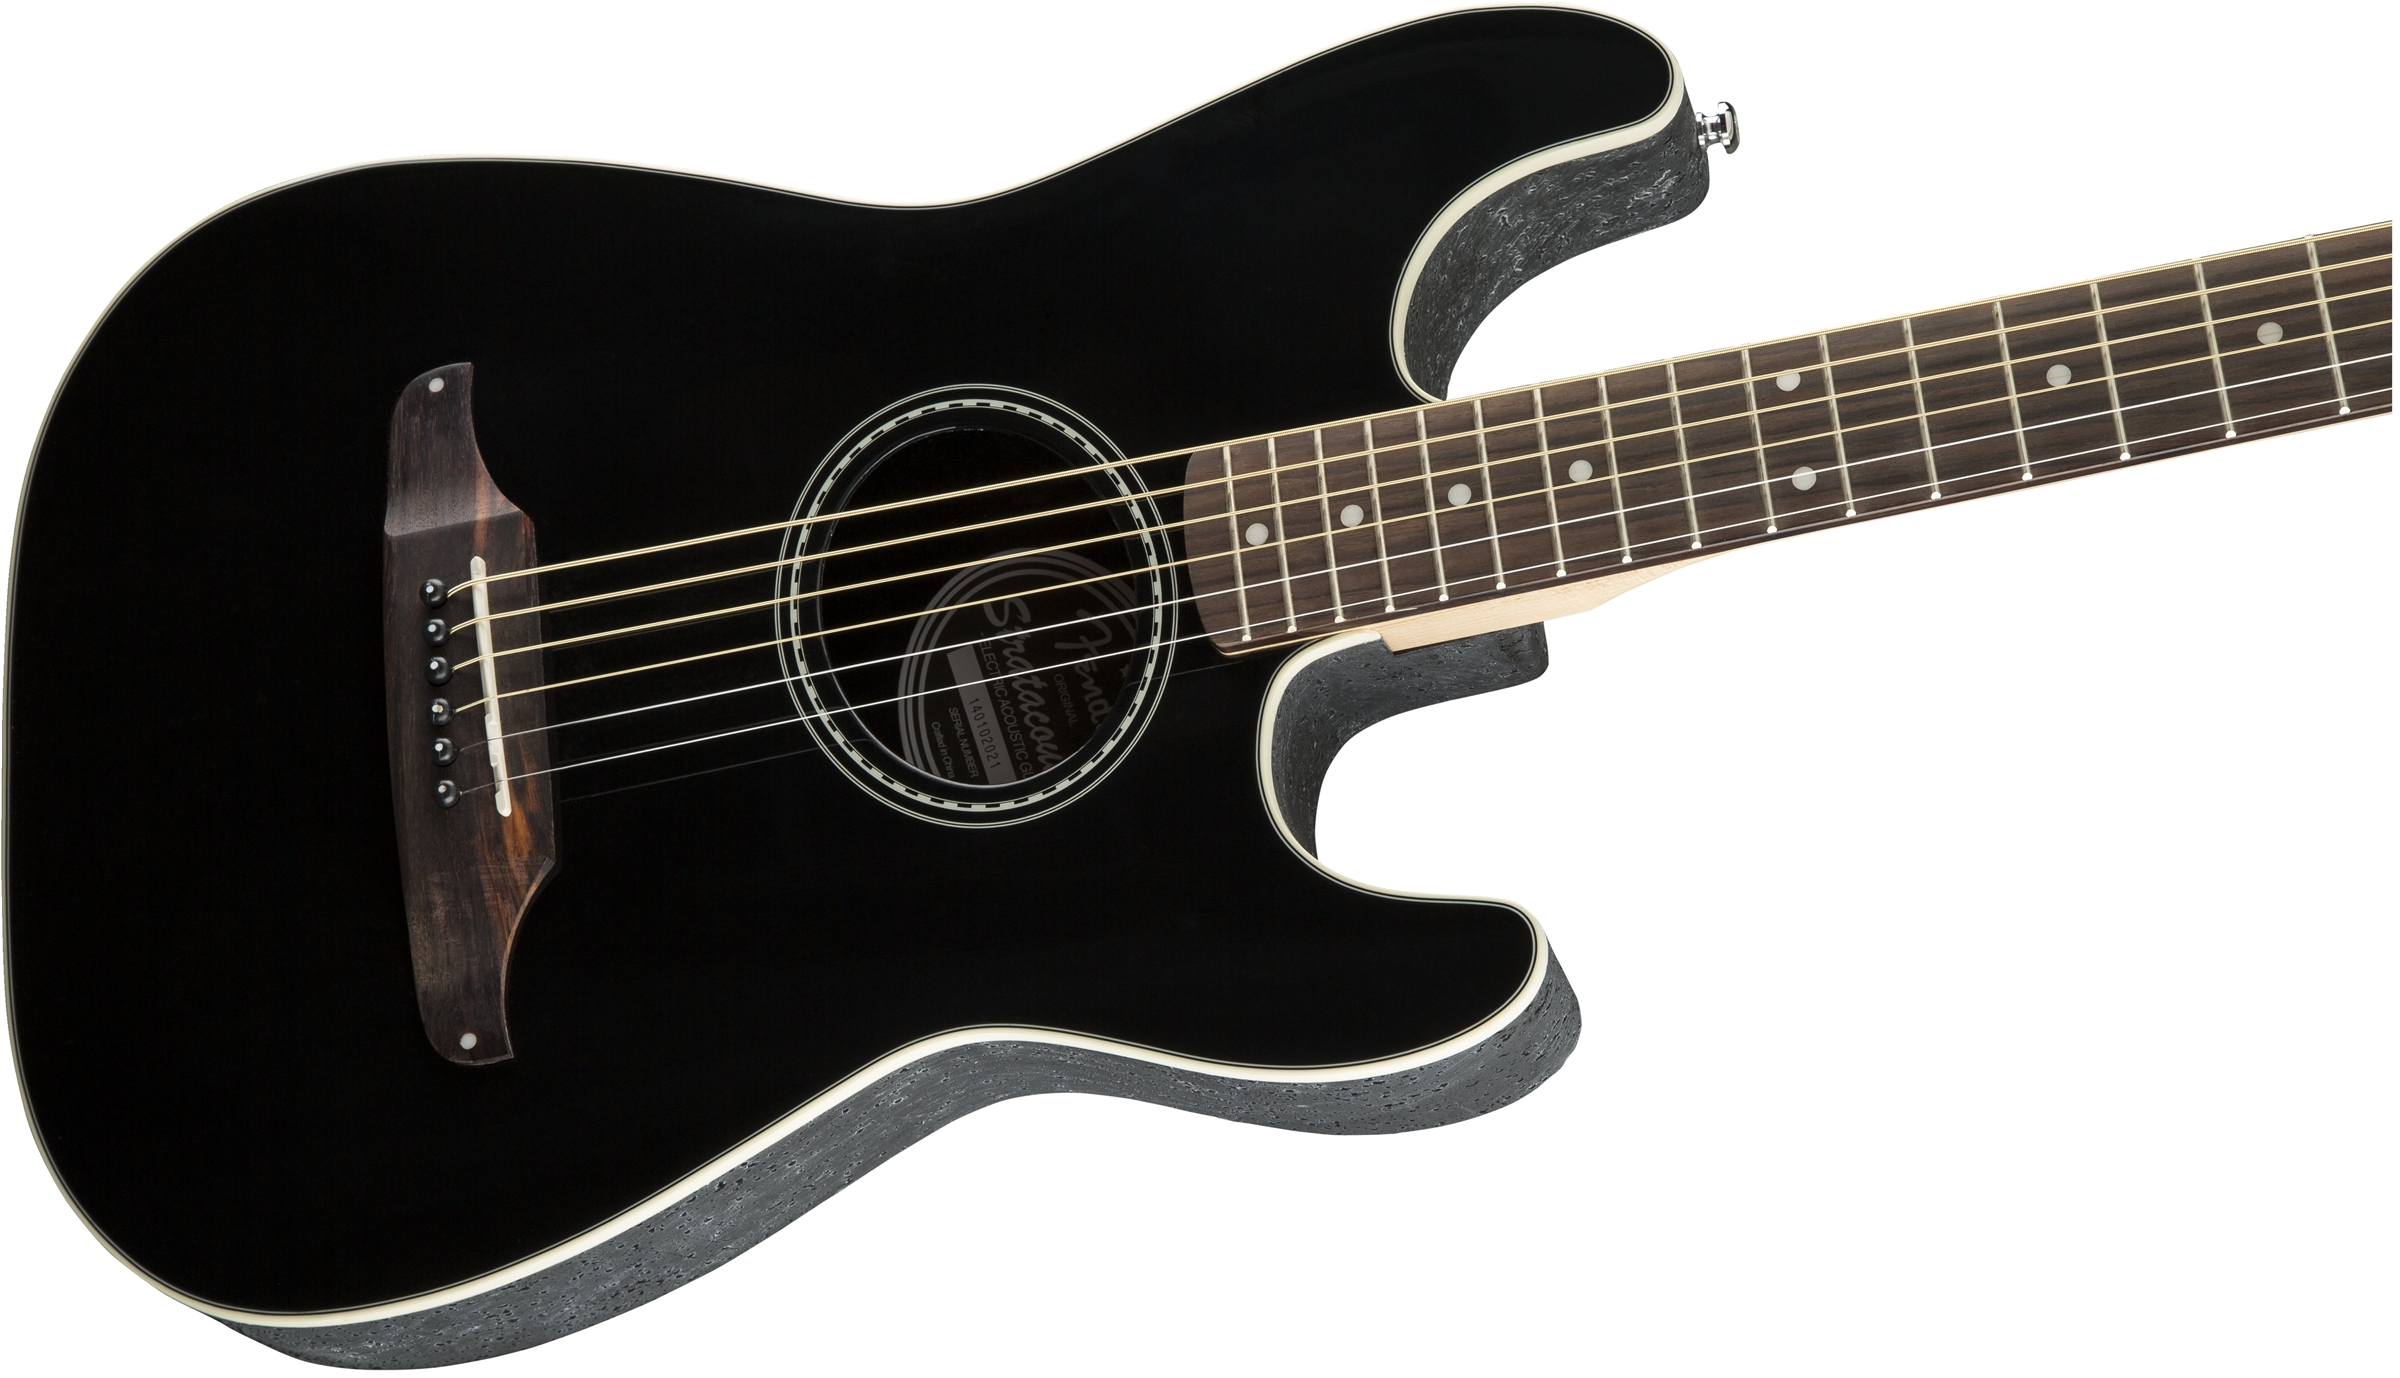 Fender Fender 174 Stratacoustic Black